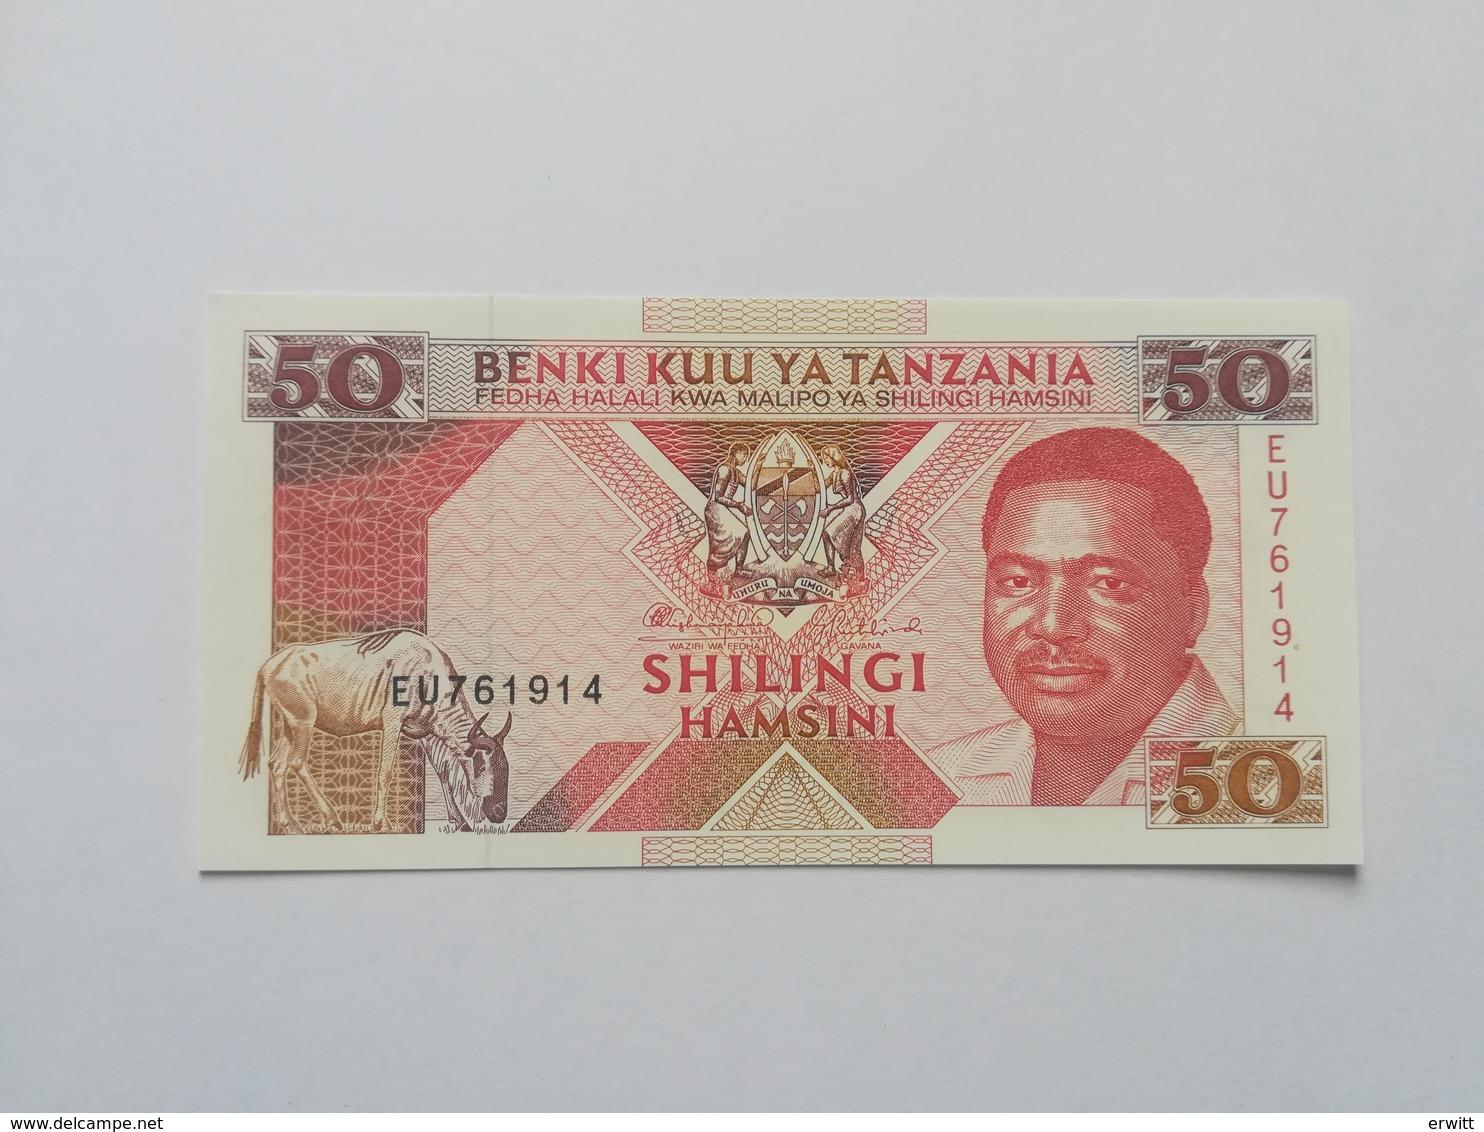 TANZANIA 50 SHILINGI 1993 - Tanzanie